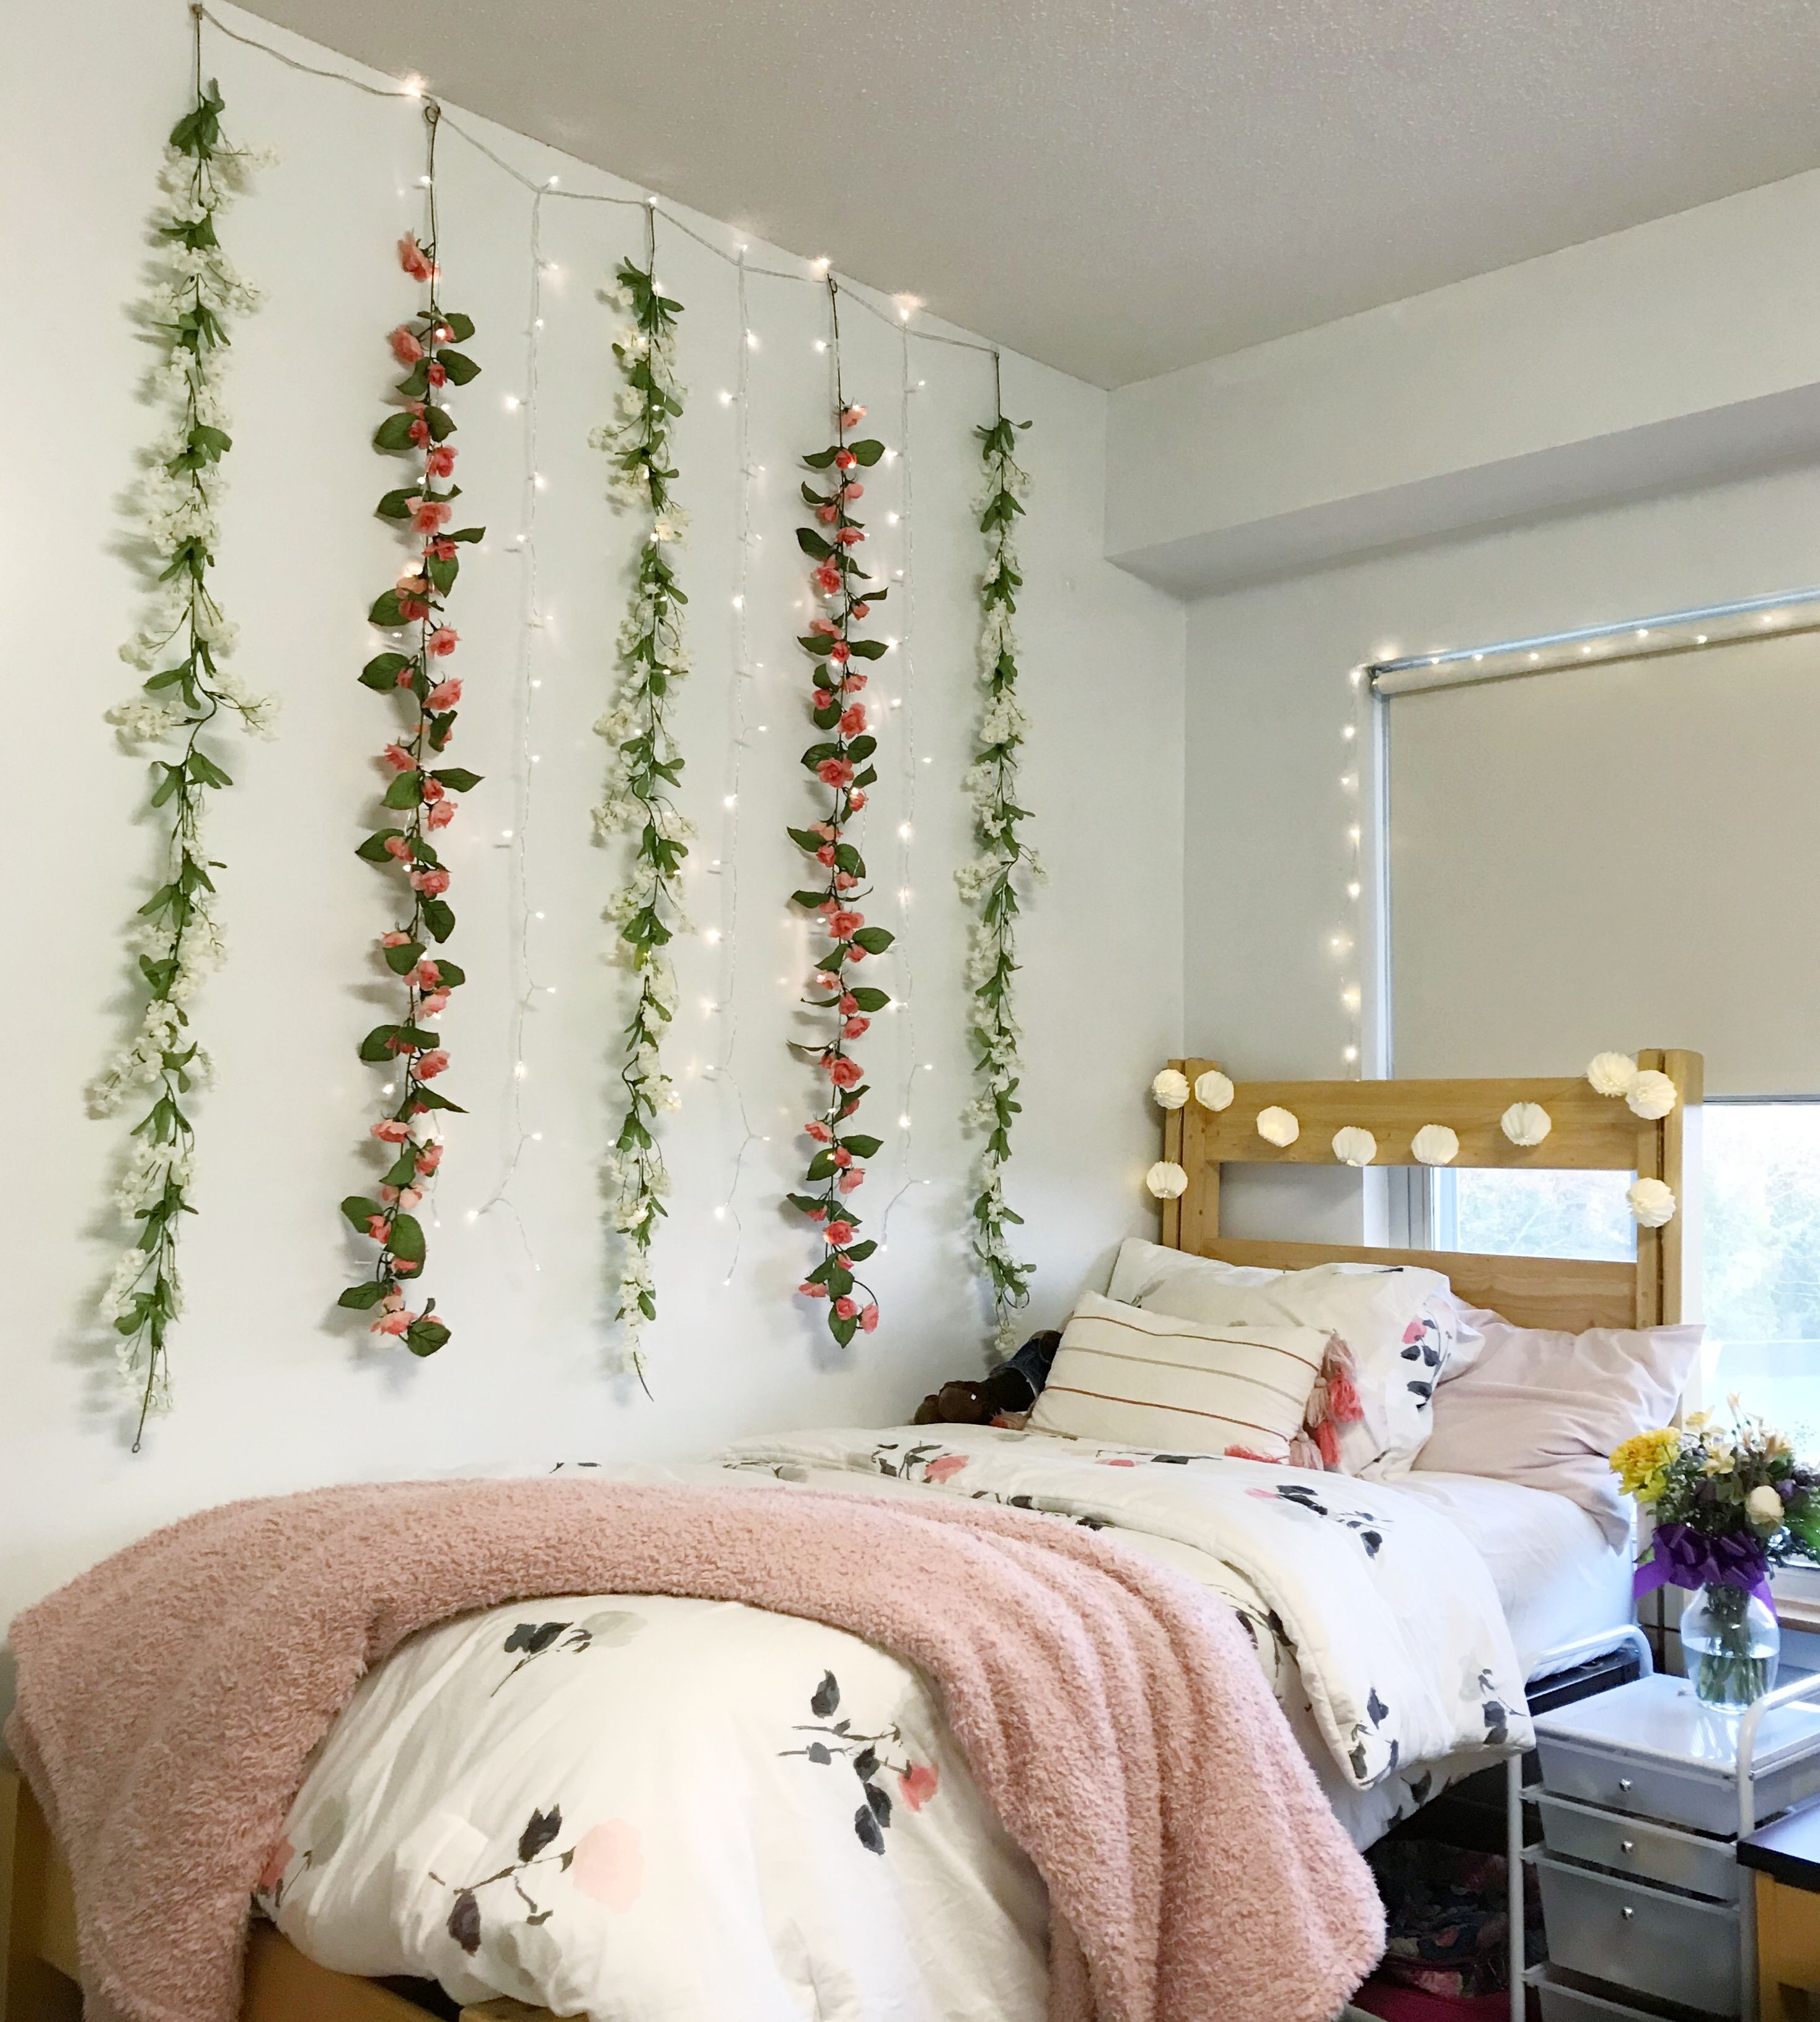 Flower Garland Wall Decor Bed Decor Flower Garlands Dorm Bedroom